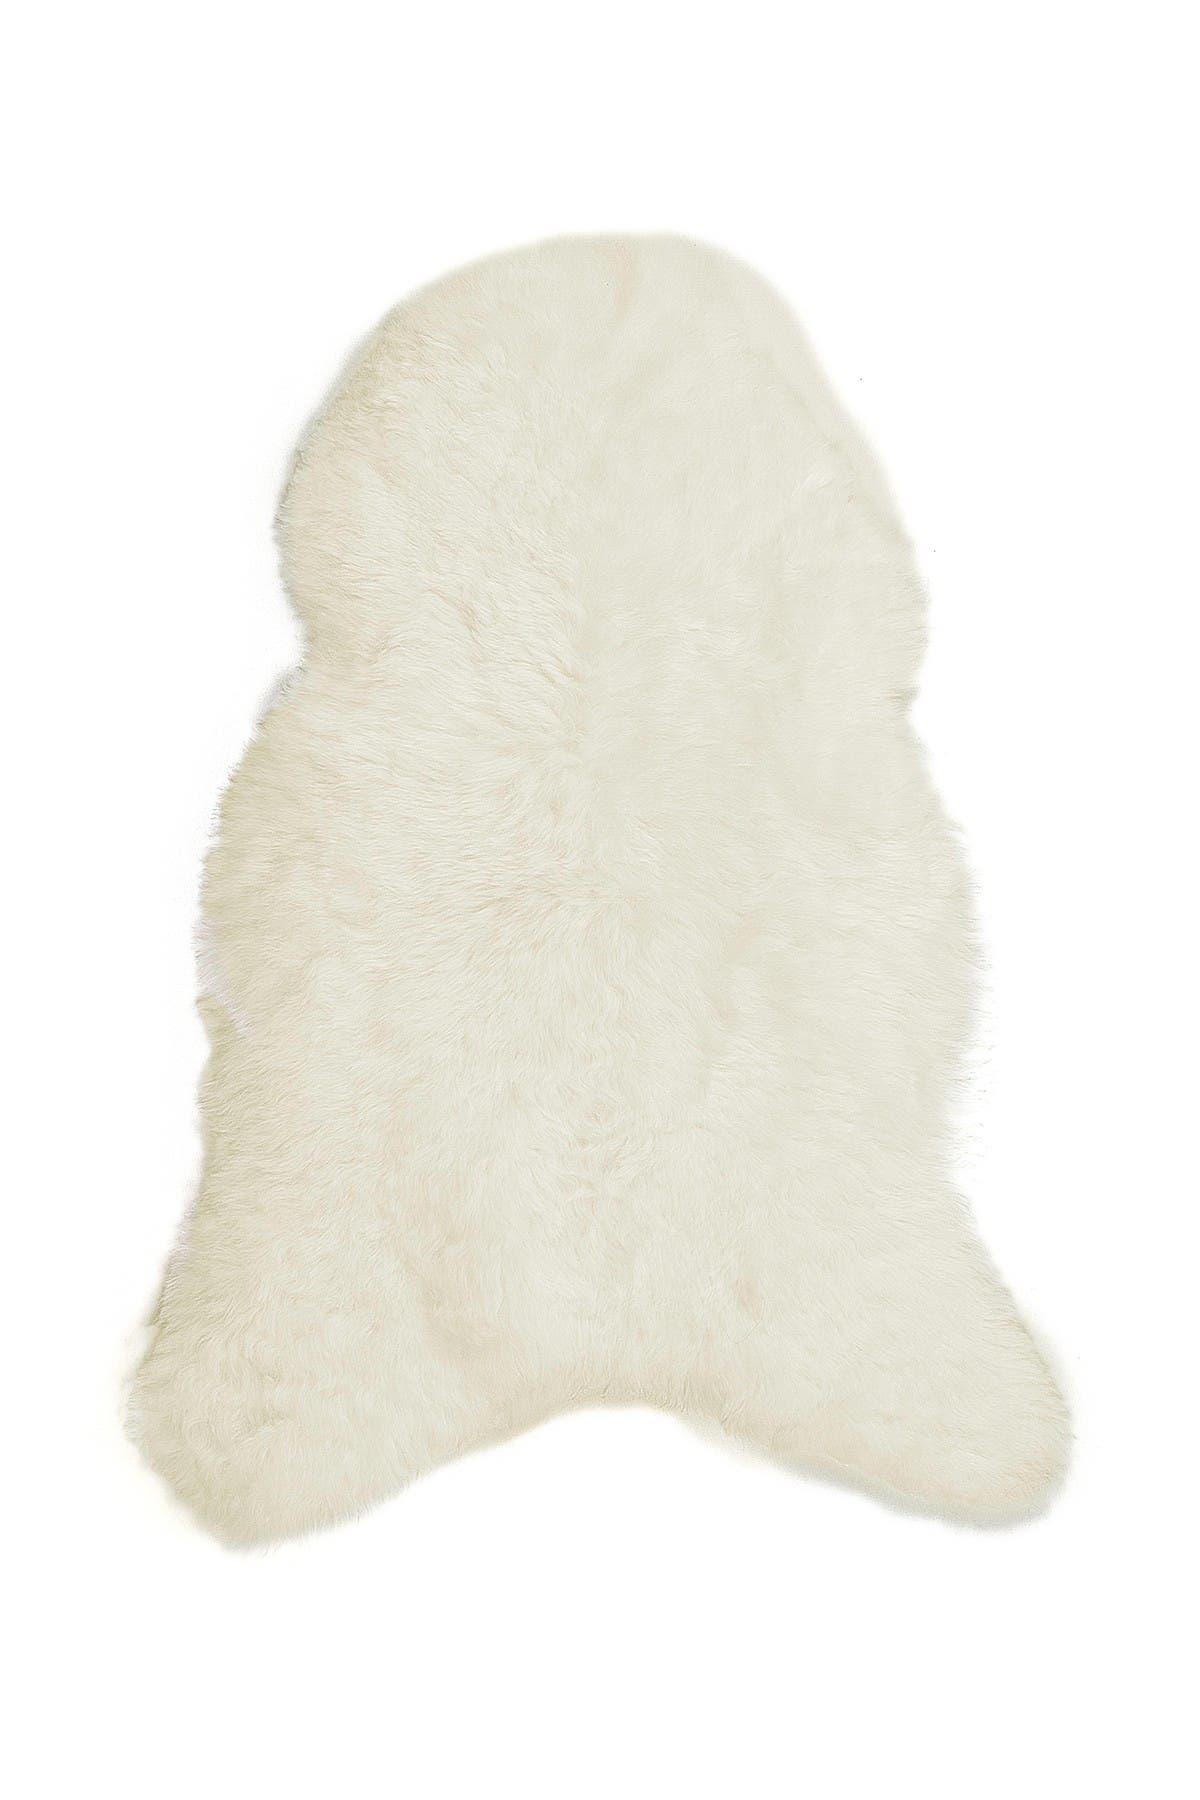 Image of Natural Icelandic Genuine Sheepskin Single Sheared Rug - White